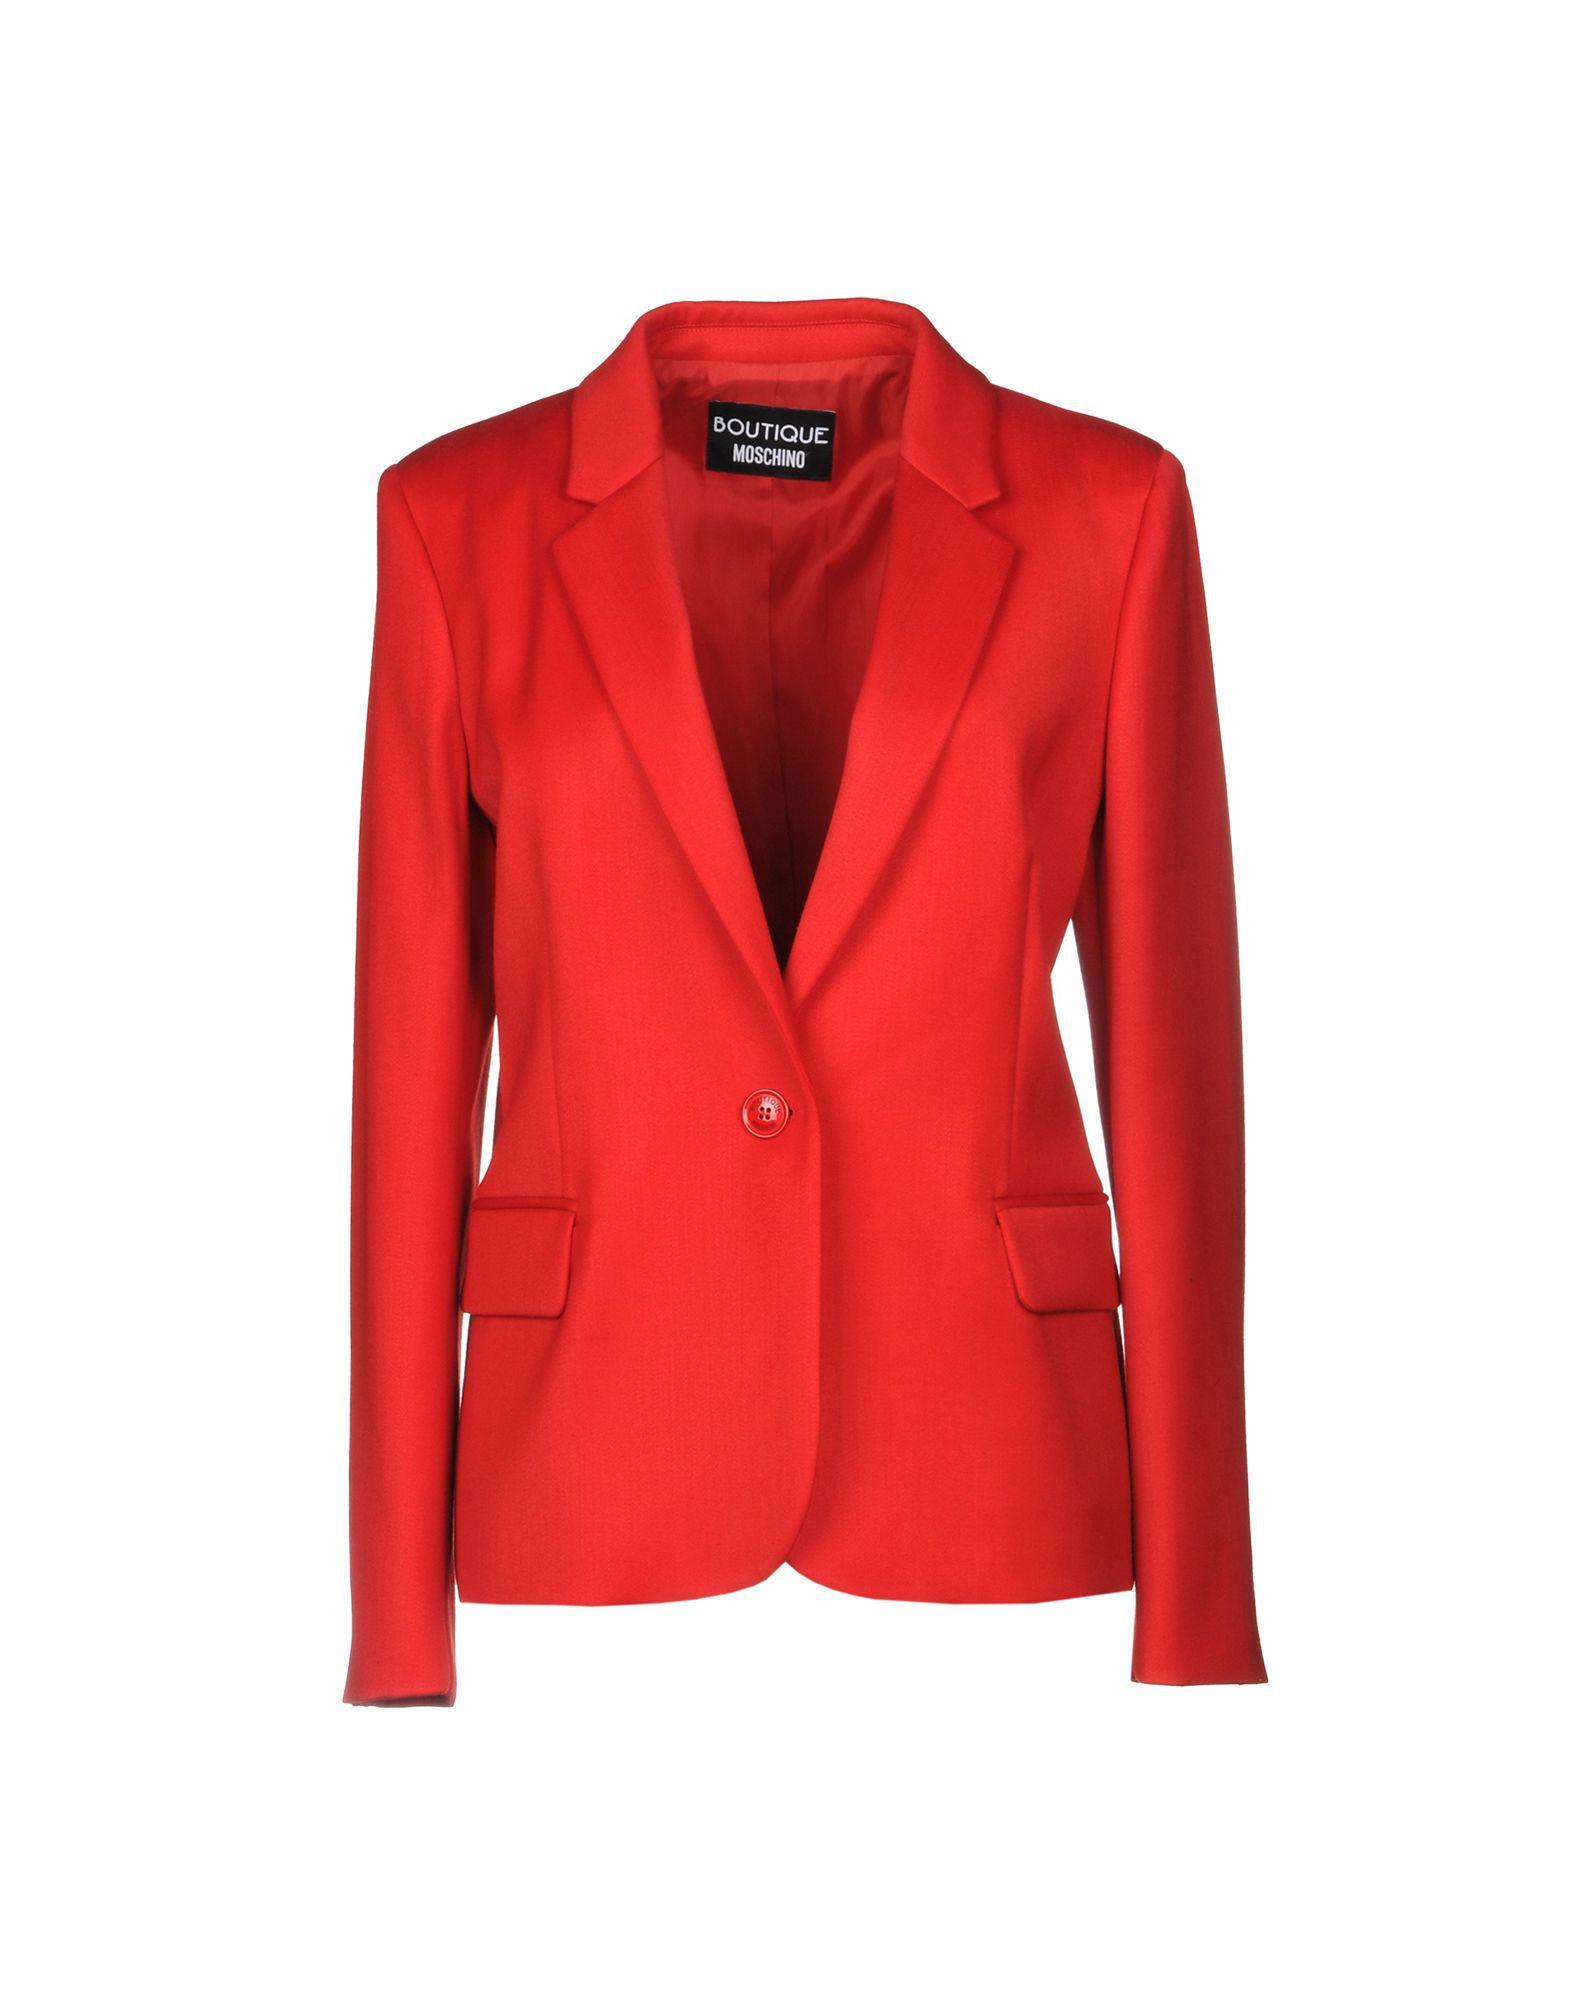 b2fe434267 Boutique Moschino Blazer in Red - Lyst